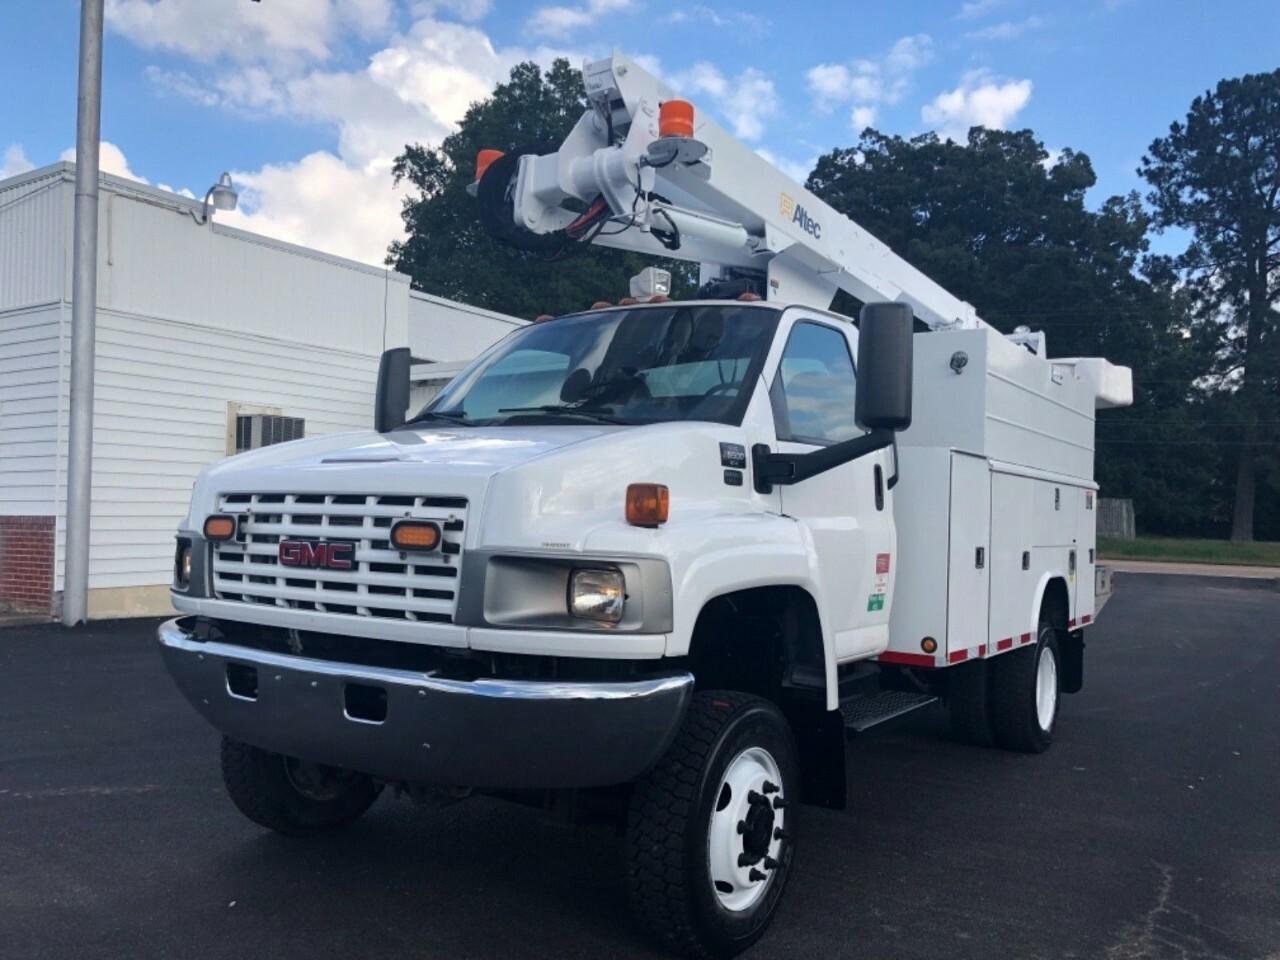 Bucket Truck Equipment For Sale Gmc Topkick C5500 4x4 Crew Cab